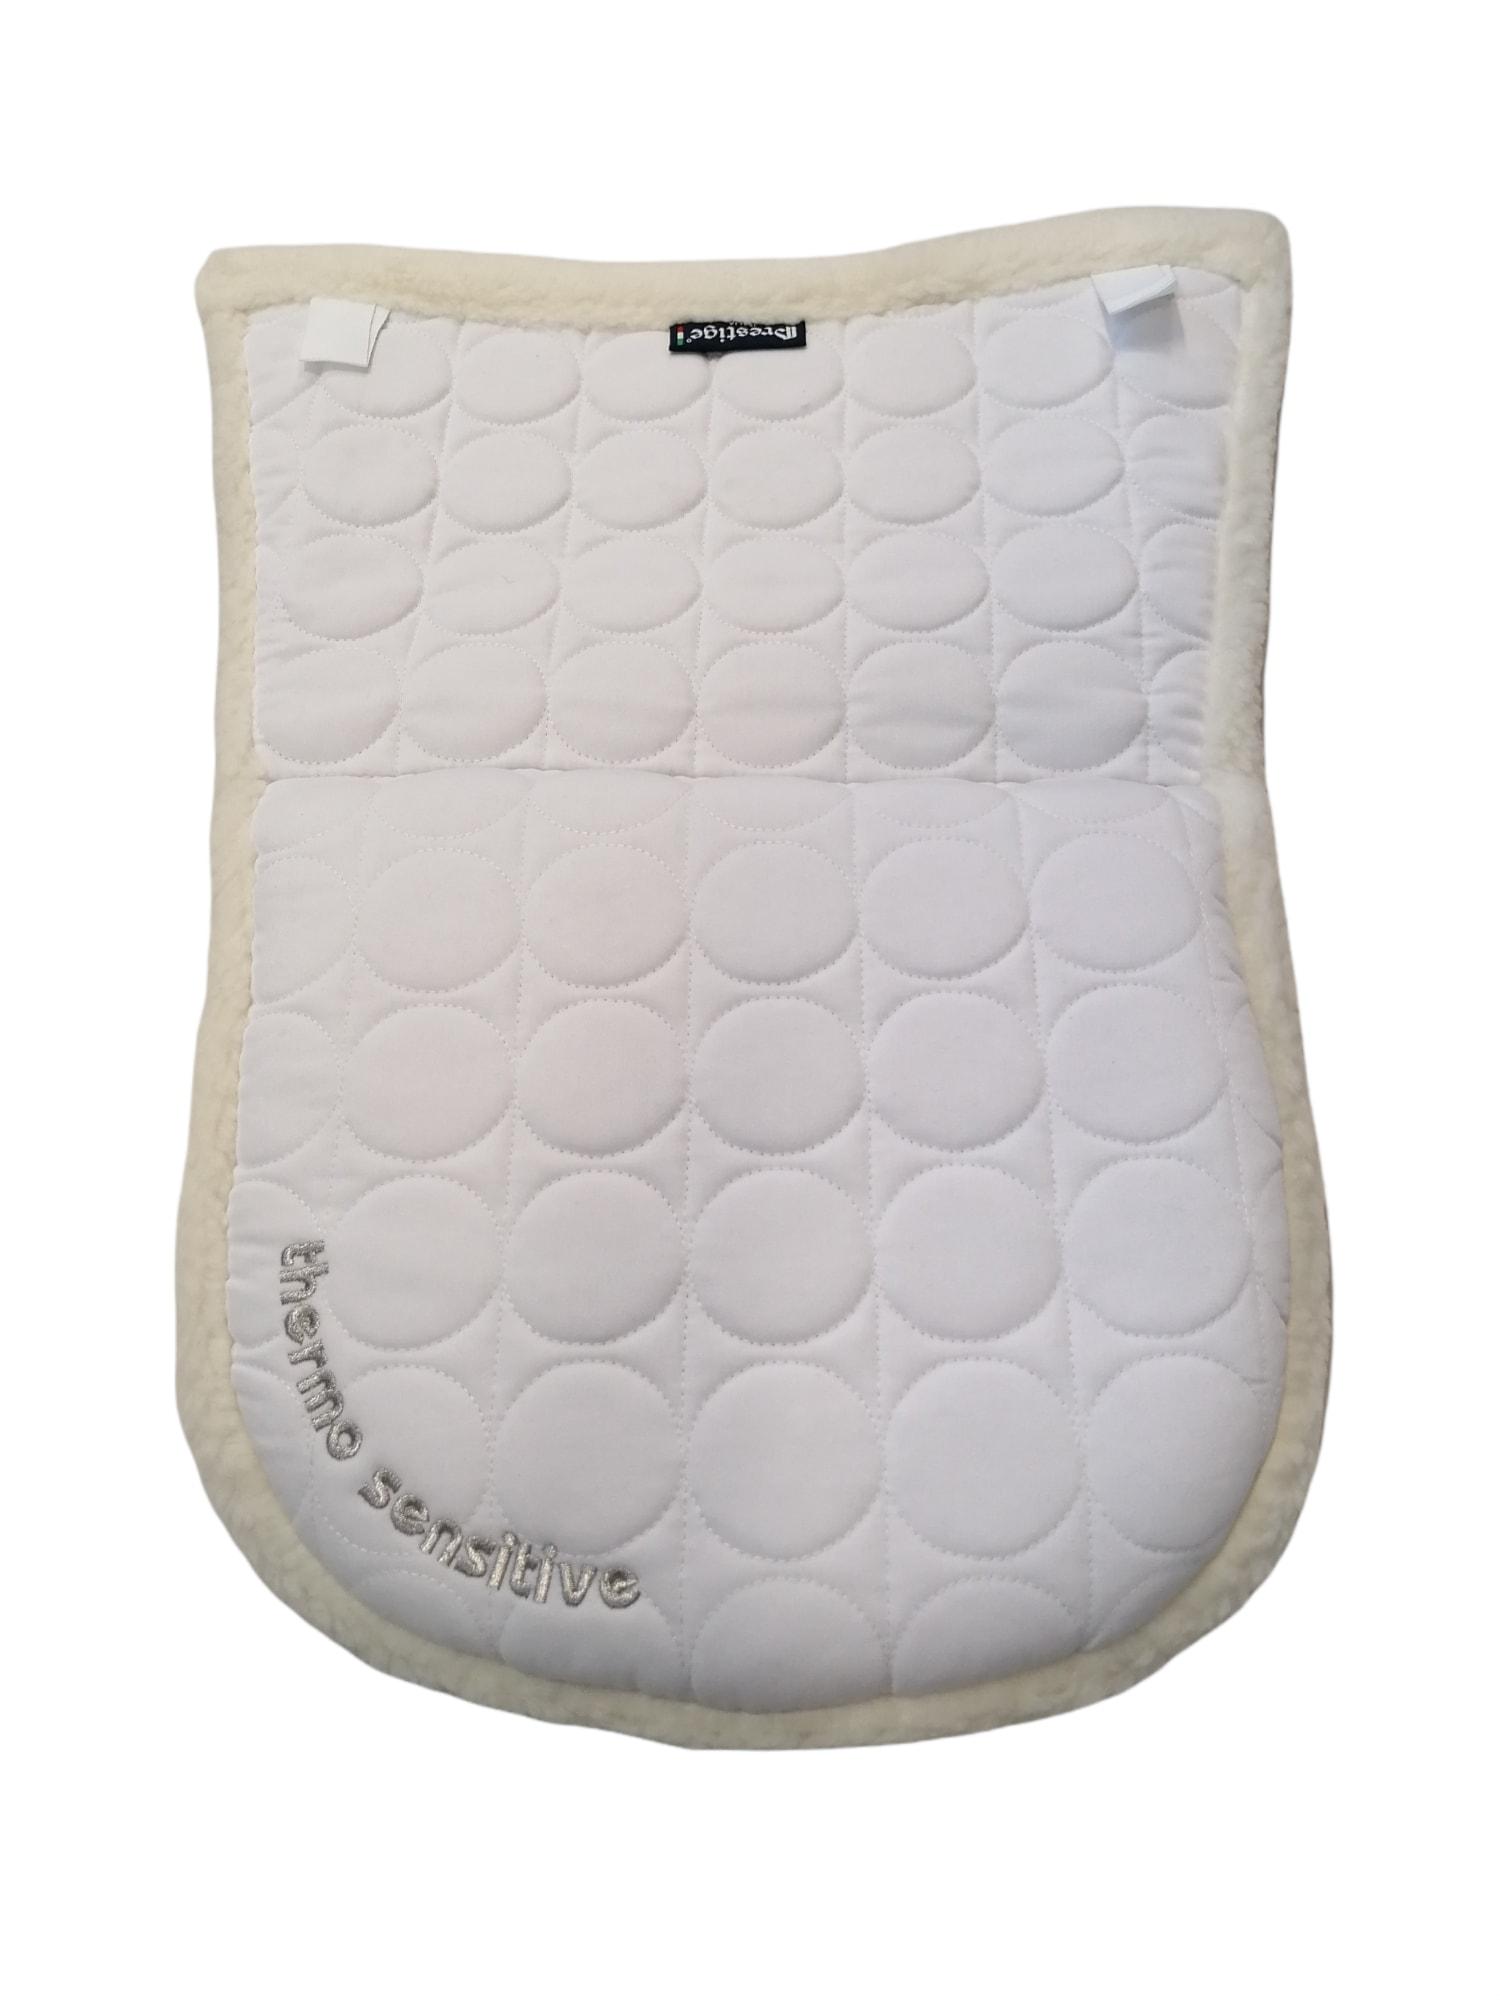 Half pad Thermo Sensitive